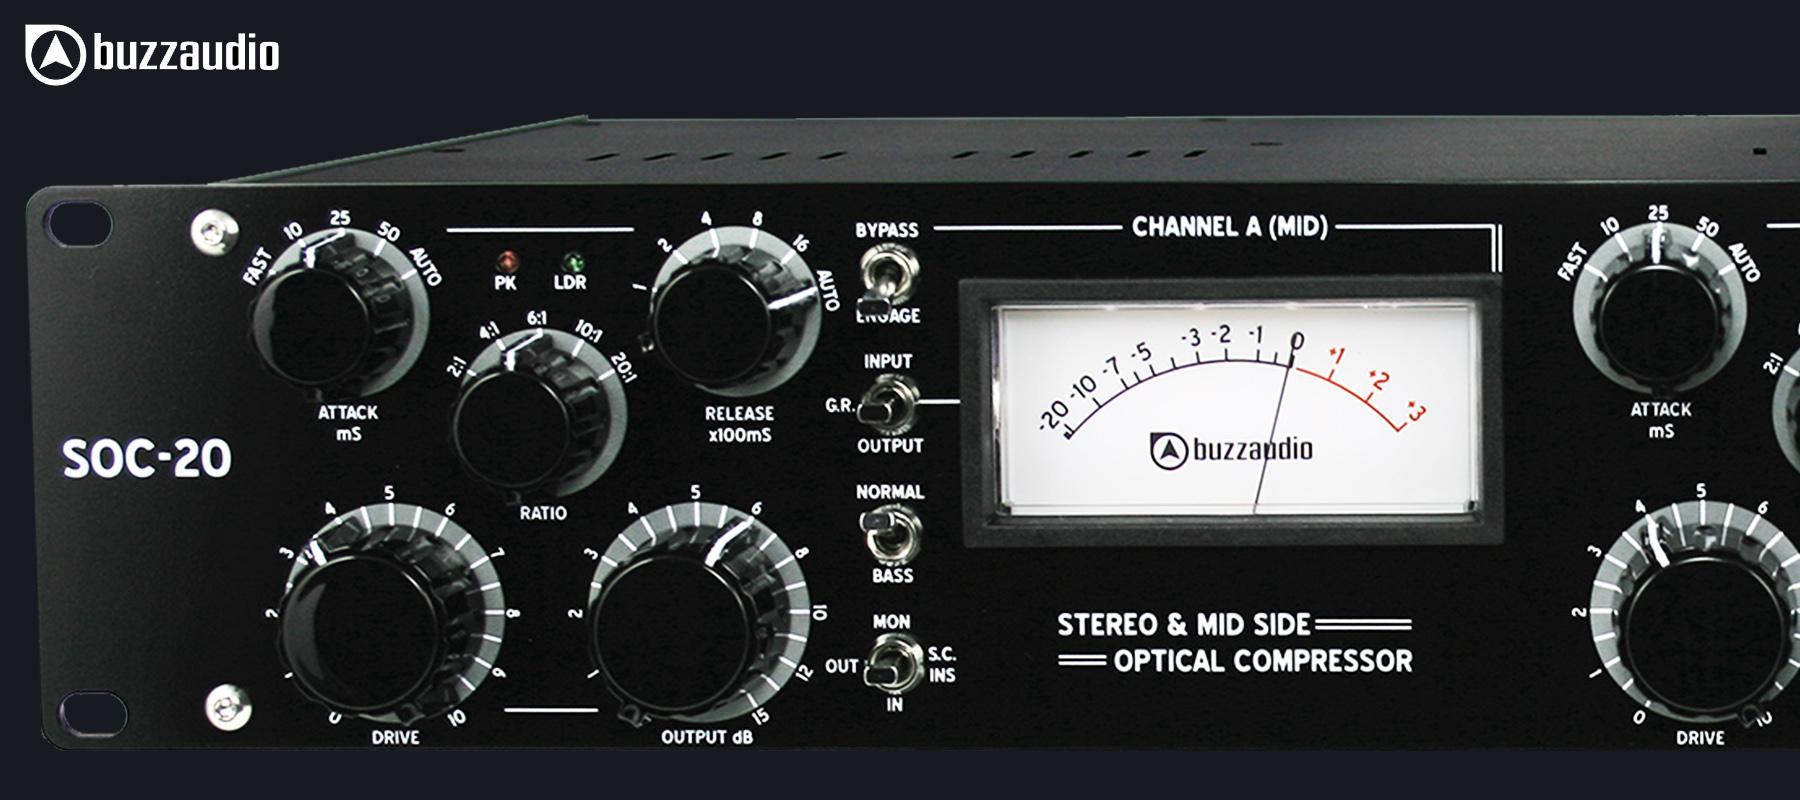 Buzz Audio SOC 20 Black - Gauche